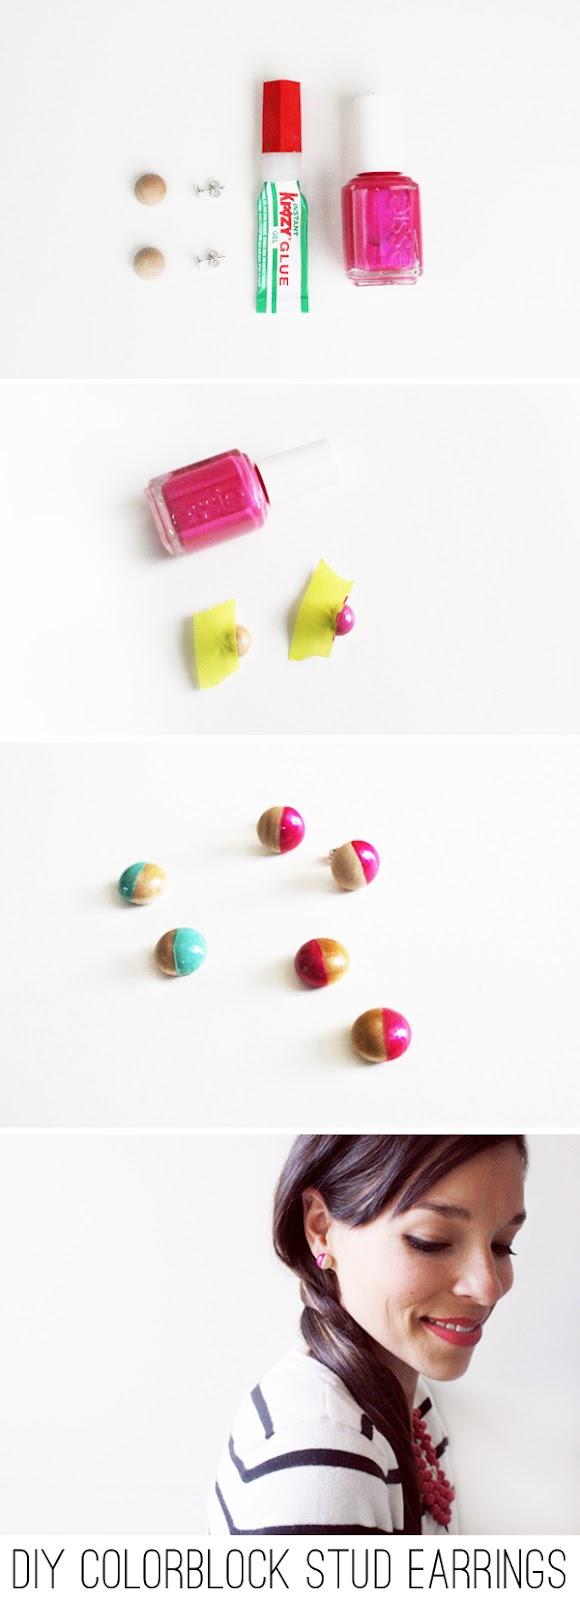 Diy nail polish studs